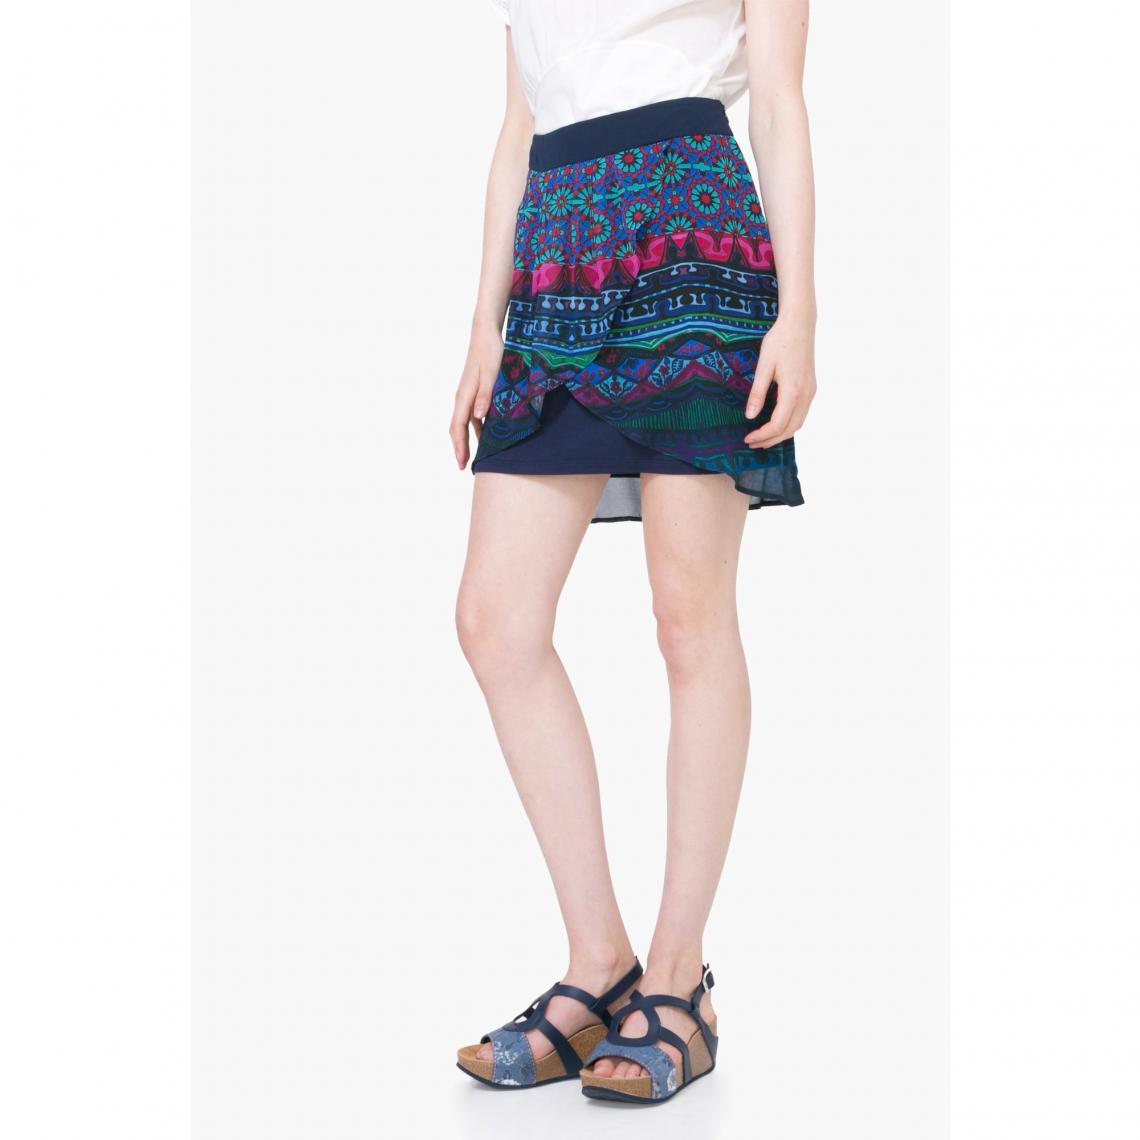 742b7d714cdc Jupe courte voile portefeuille femme Desigual - Multicolore Desigual Femme